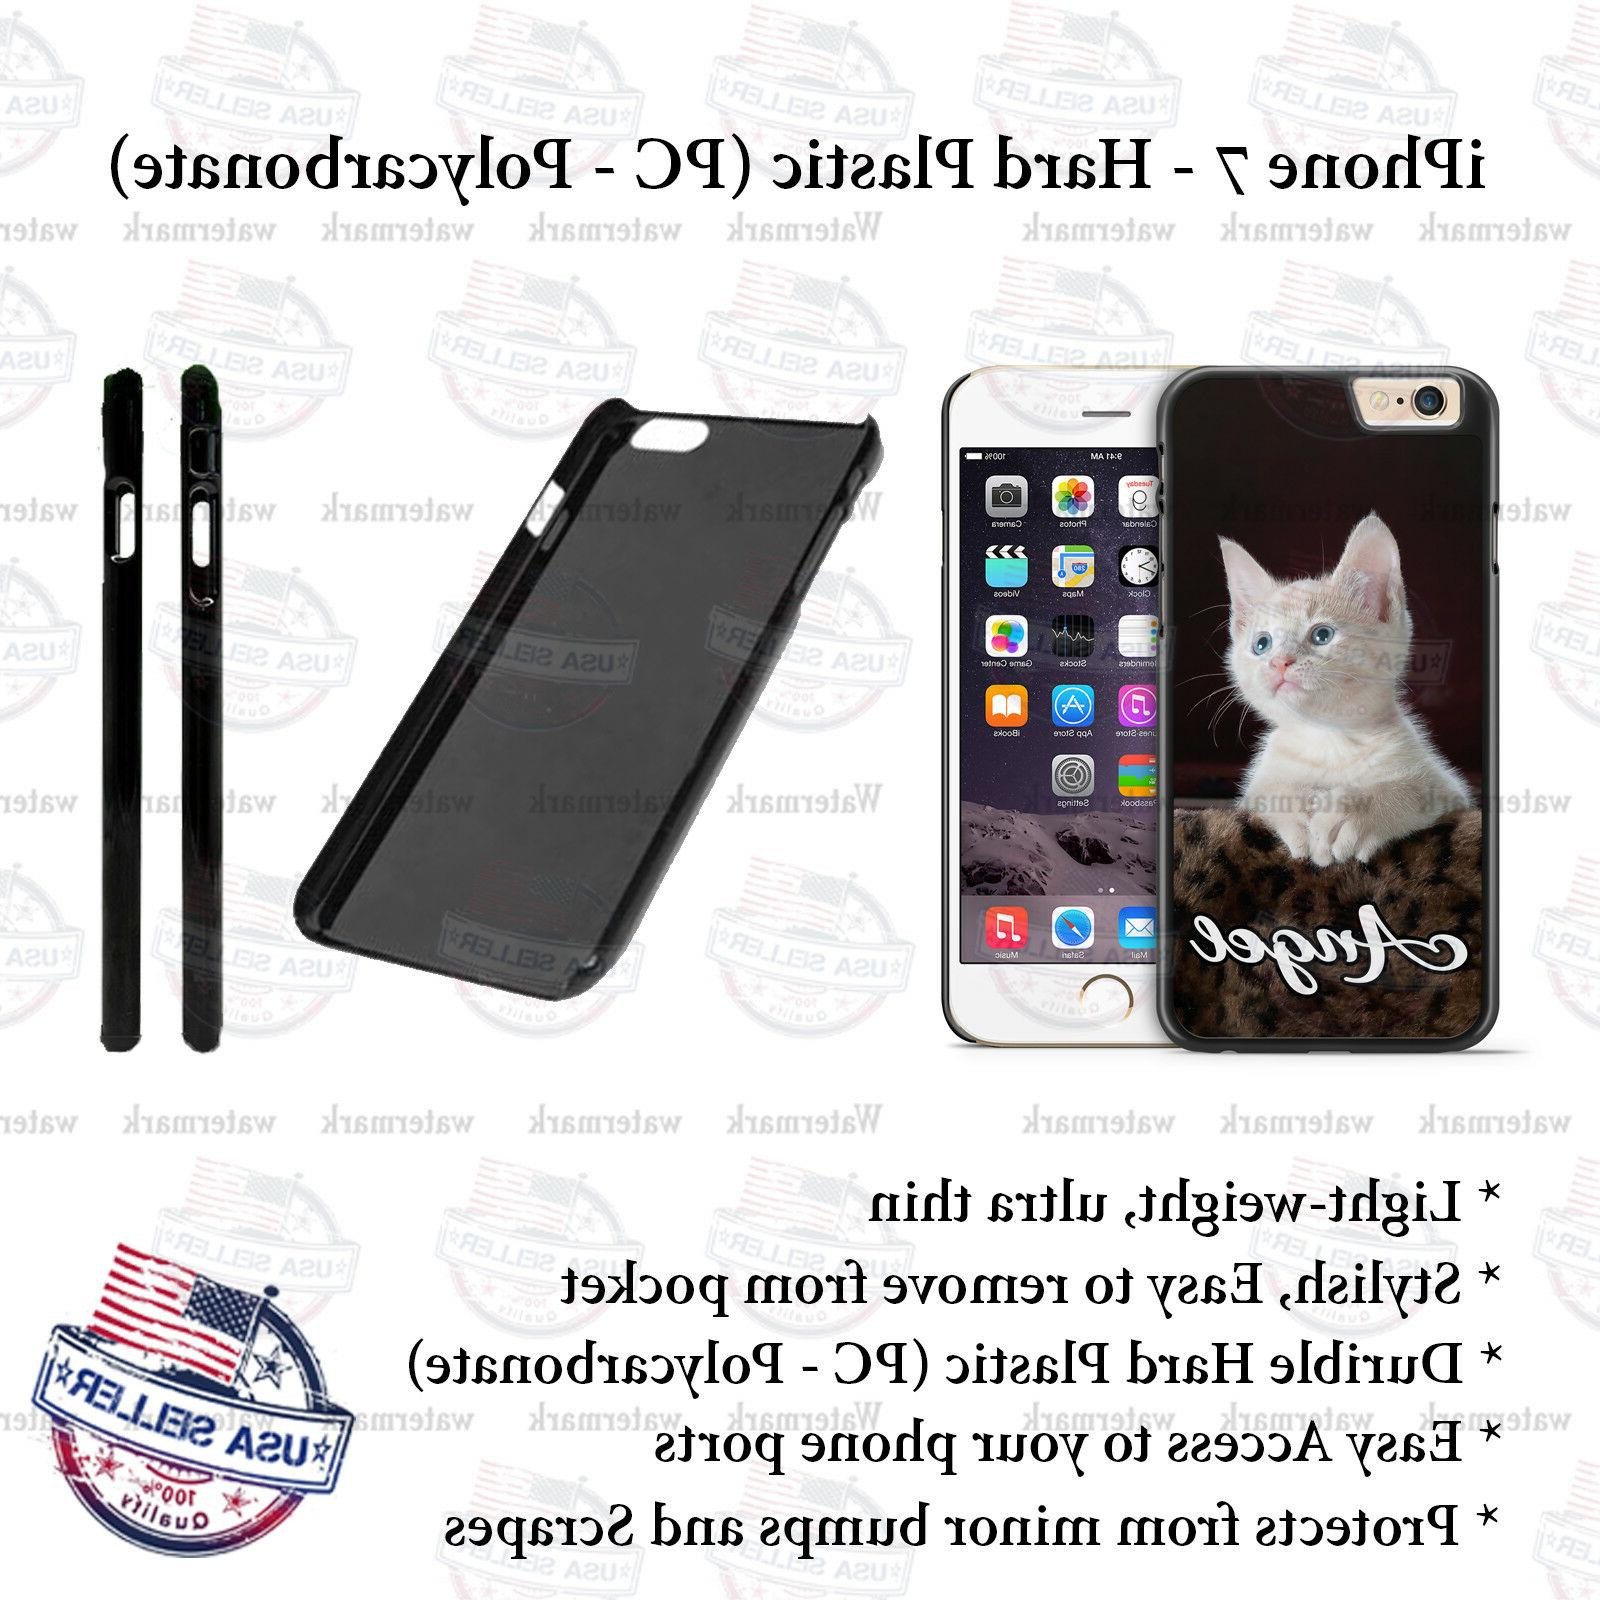 101 Dalmatians Animated Phone Case Fits iPhone Google LG